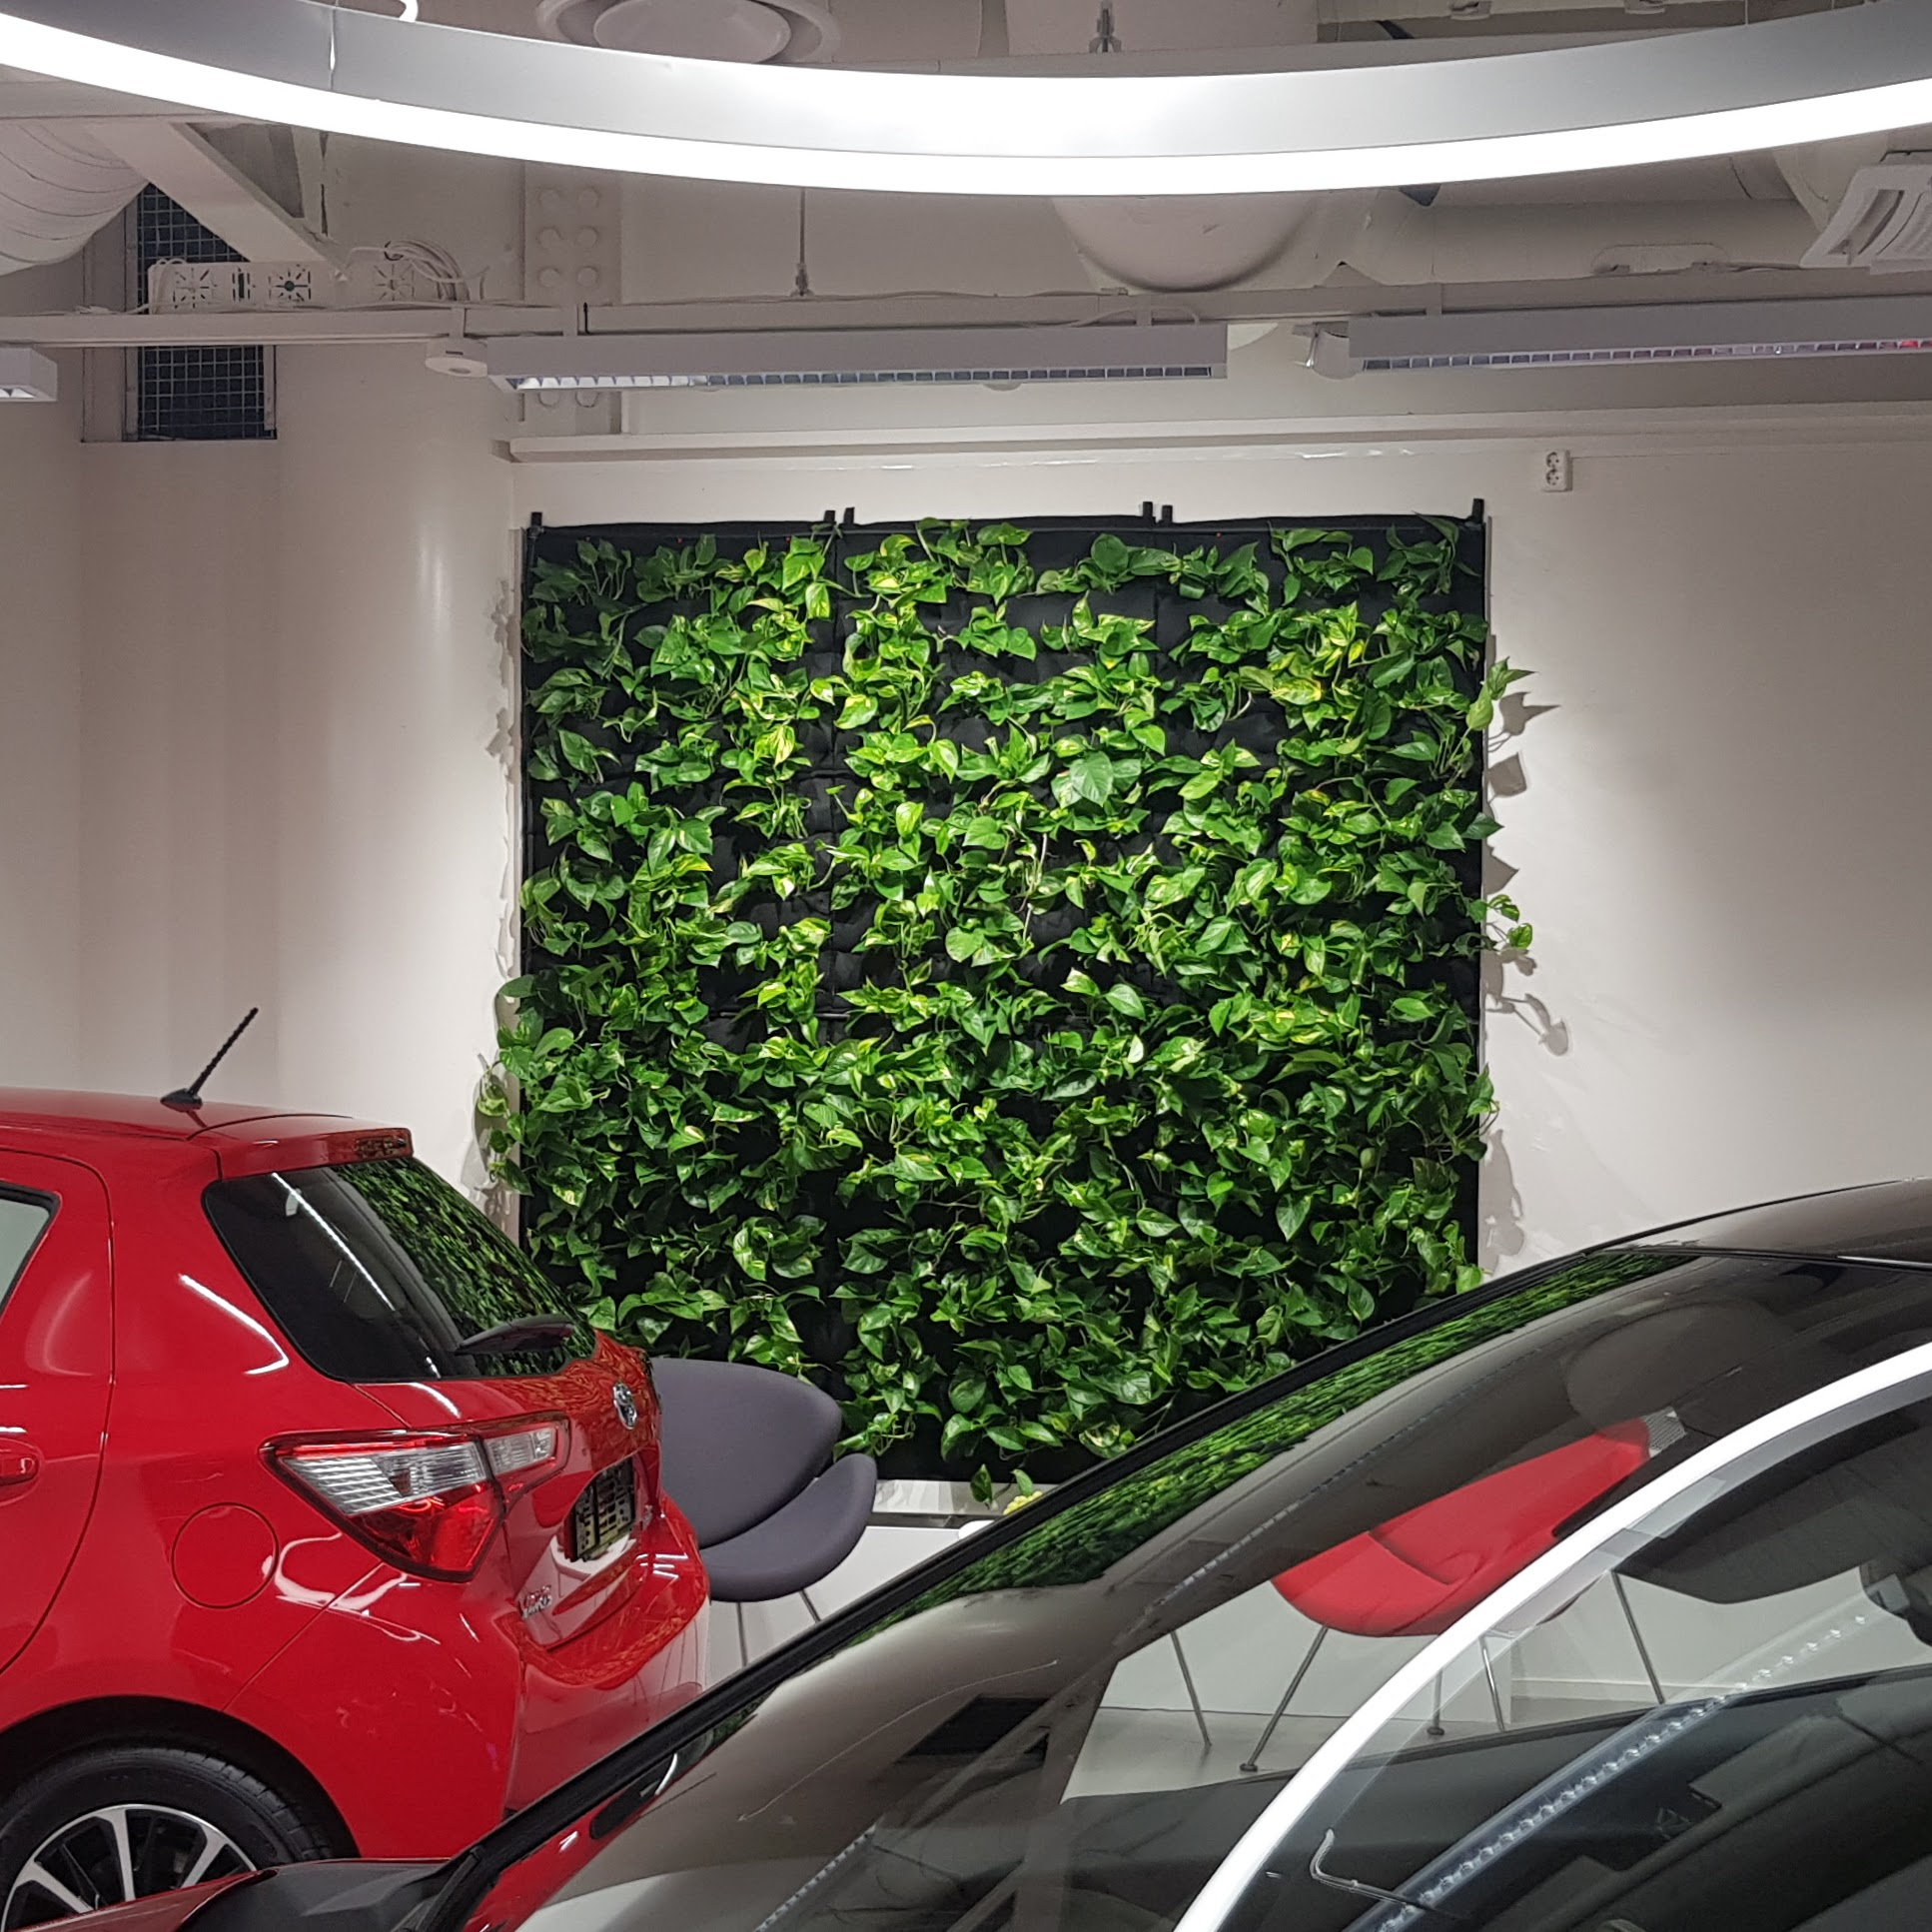 Florafelt Pockets Living Wall for Toyota Showroom by Pasi Lindberg Viherolo Oy Finland.